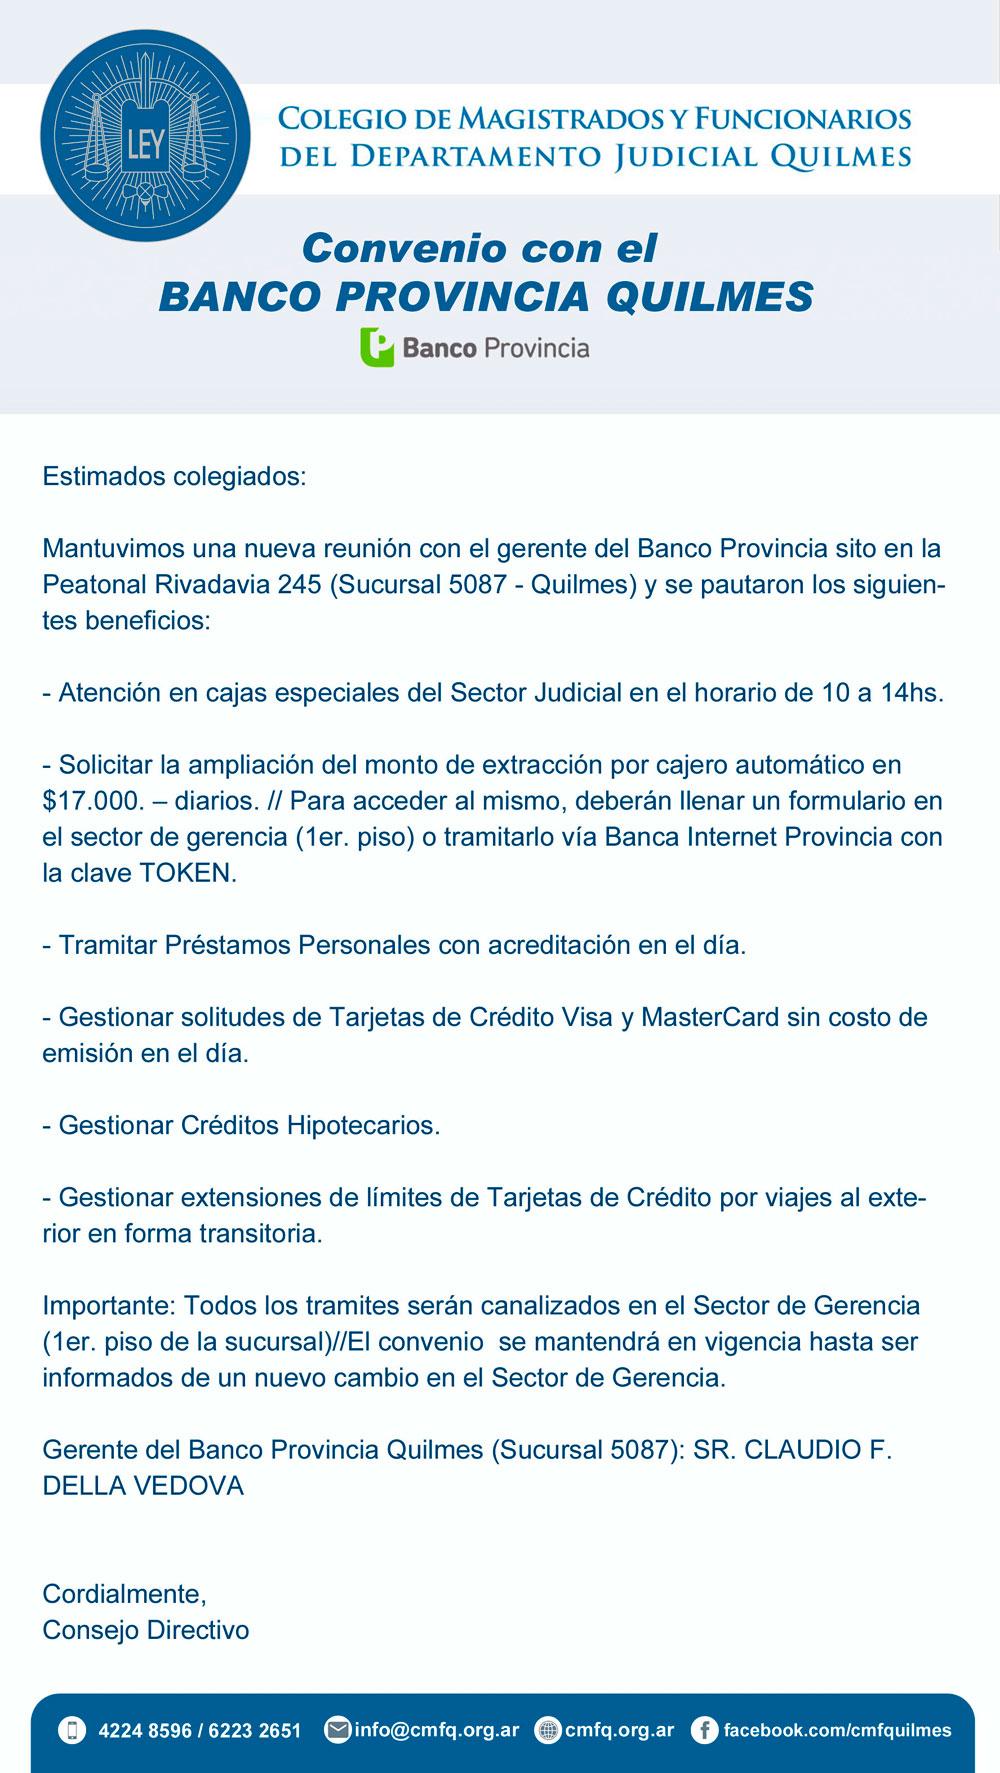 Convenio//BANCO PROVINCIA (Sucursal 5087-Quilmes)